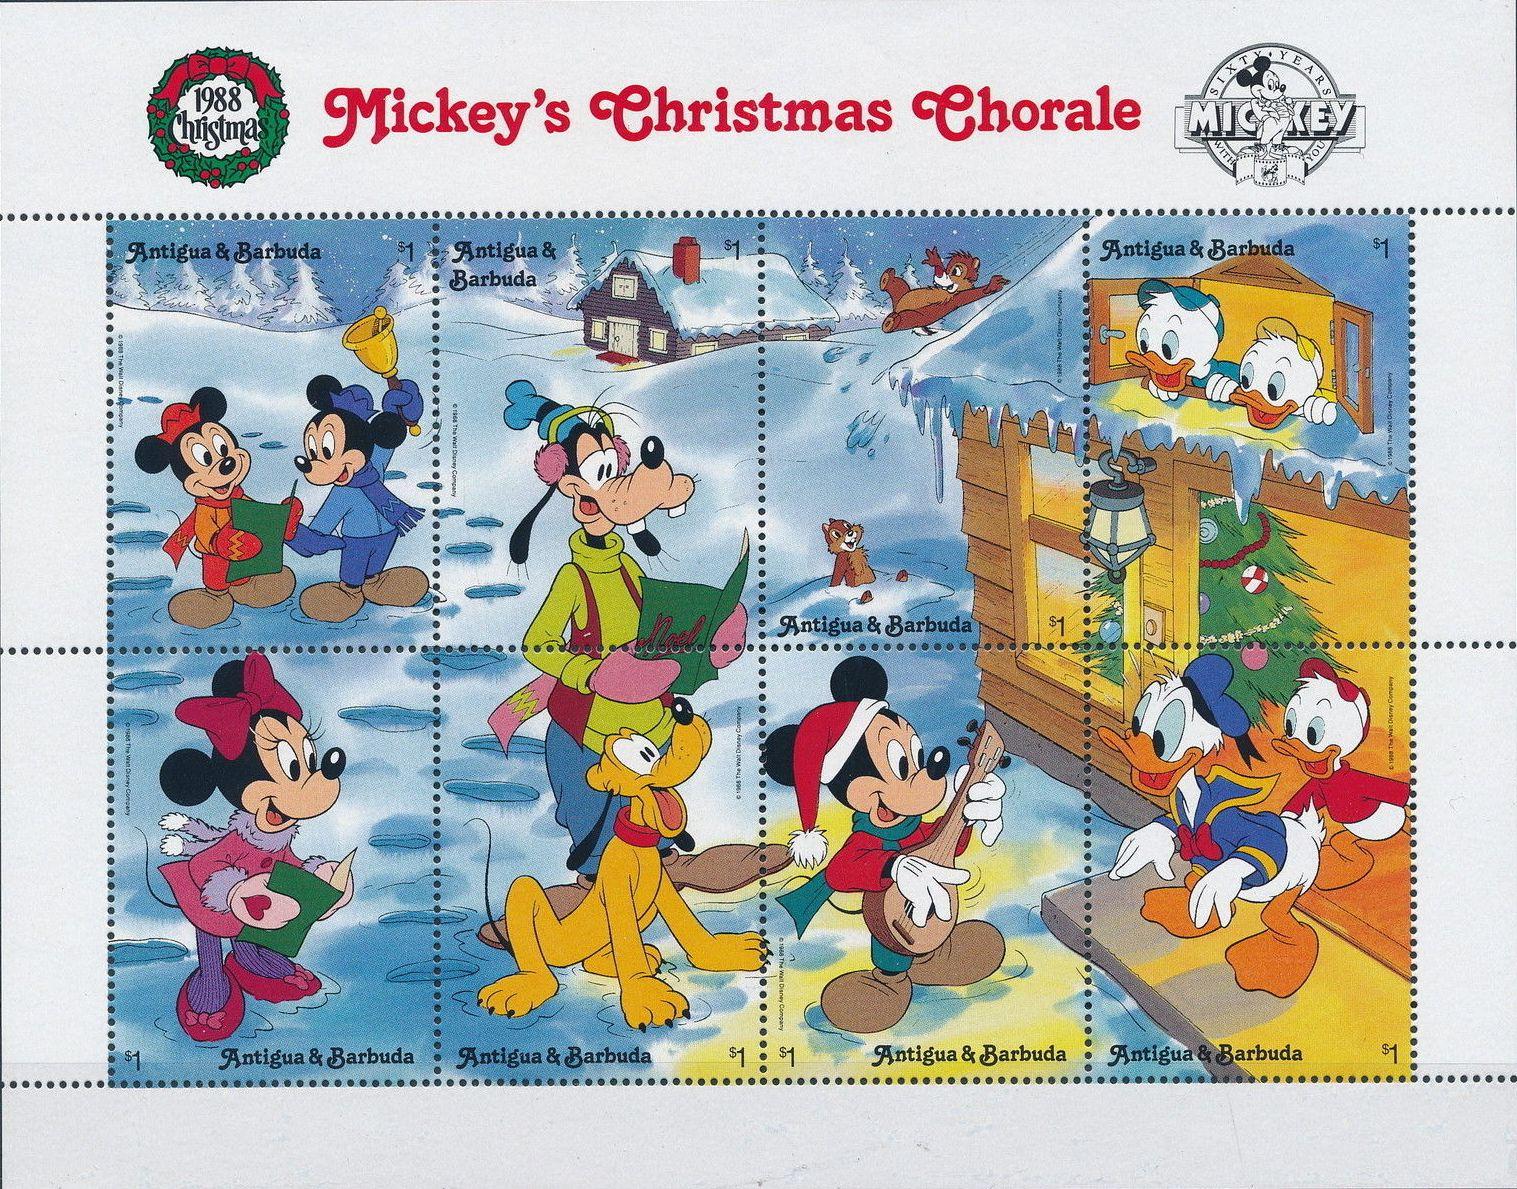 Antigua and Barbuda 1988 Disney - Mickey's Christmas Chorale